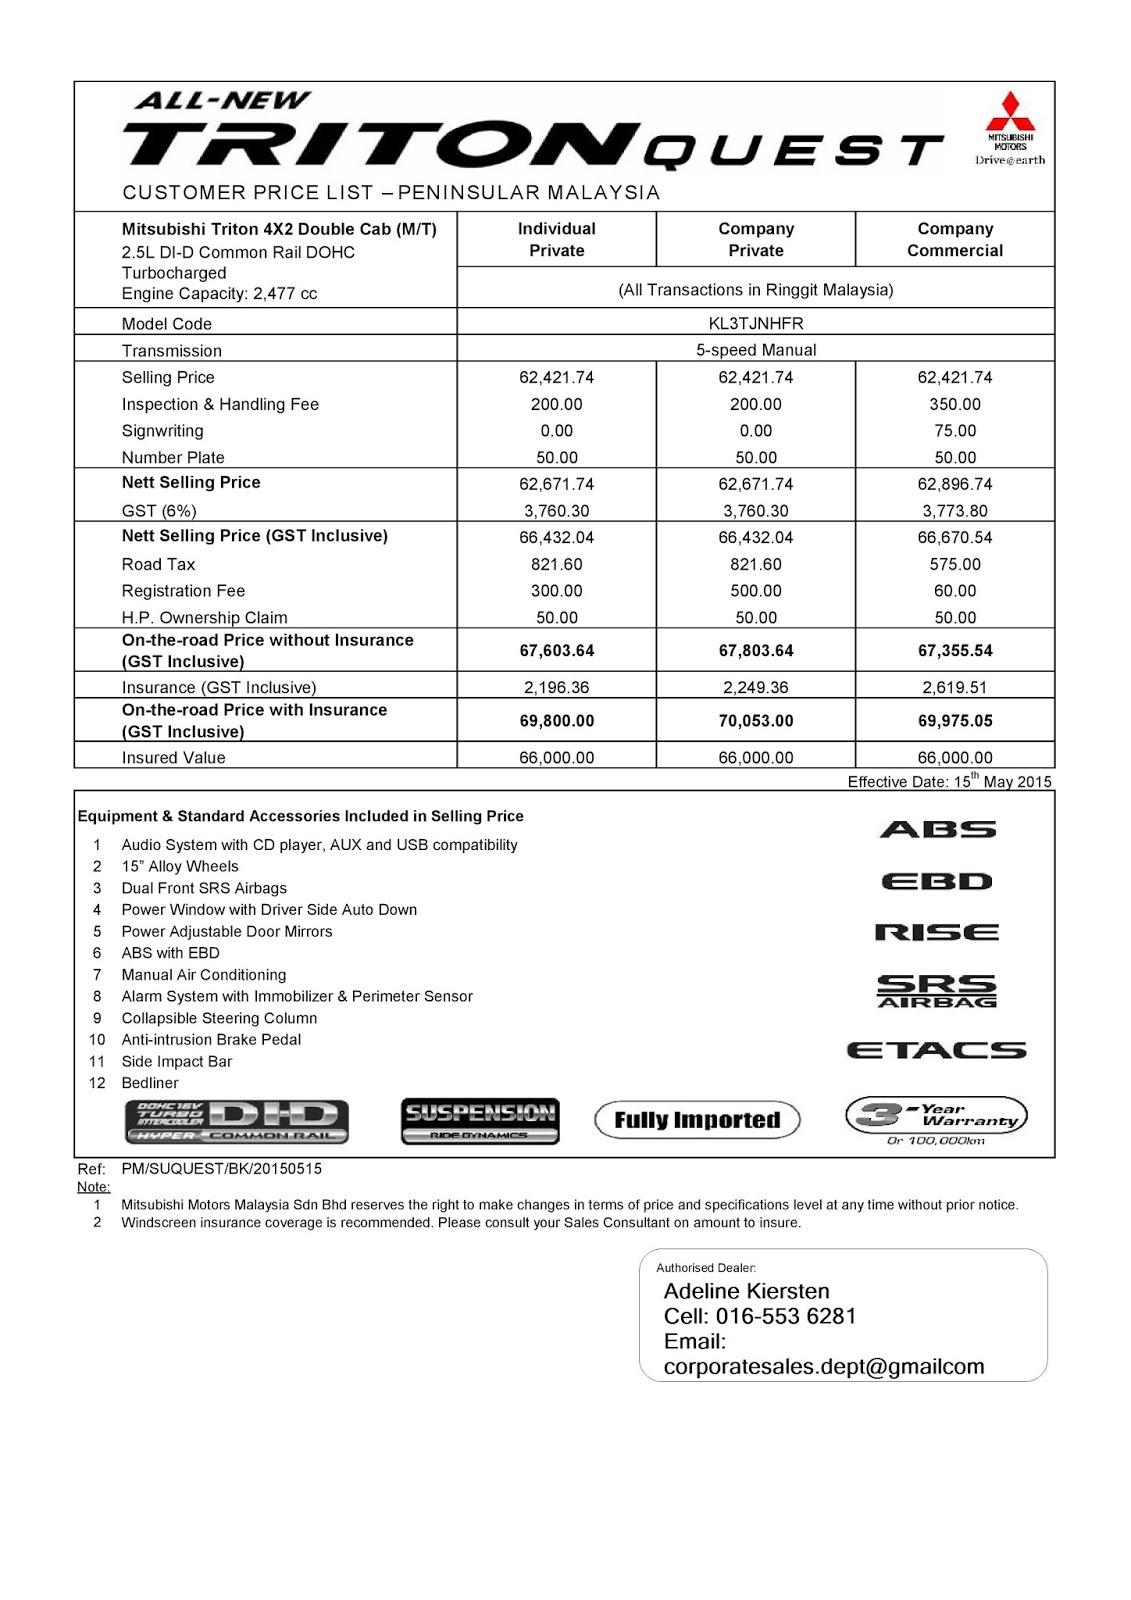 Mitsubishi Triton Price List